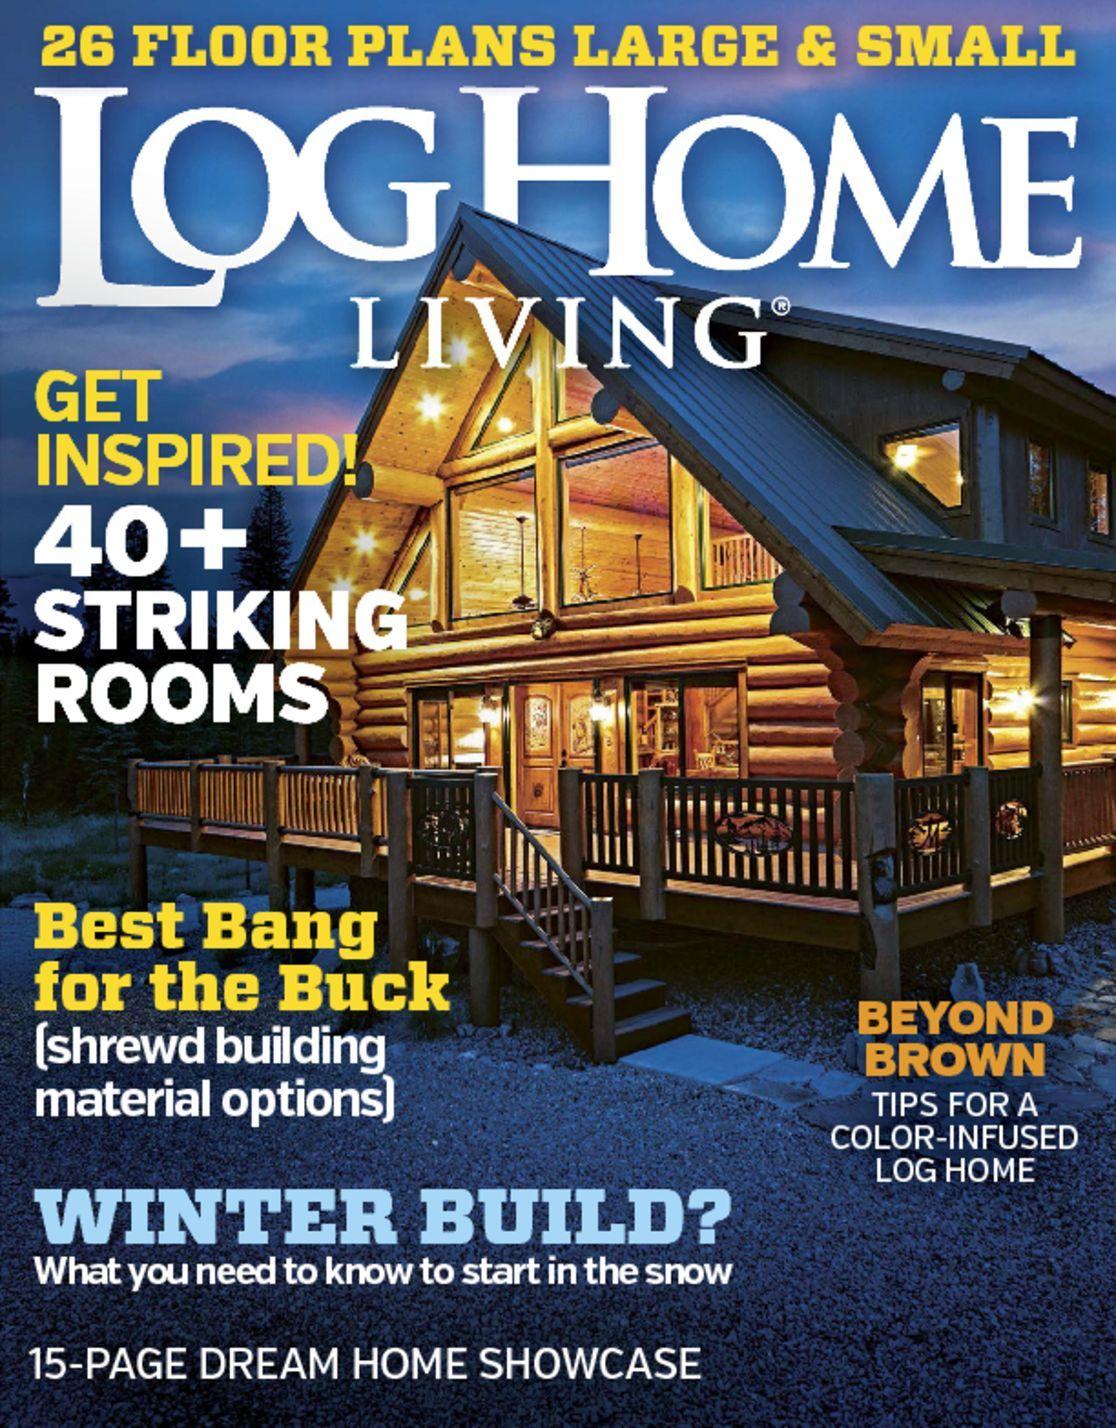 4916 log home living cover 2016 january for Log homes magazine